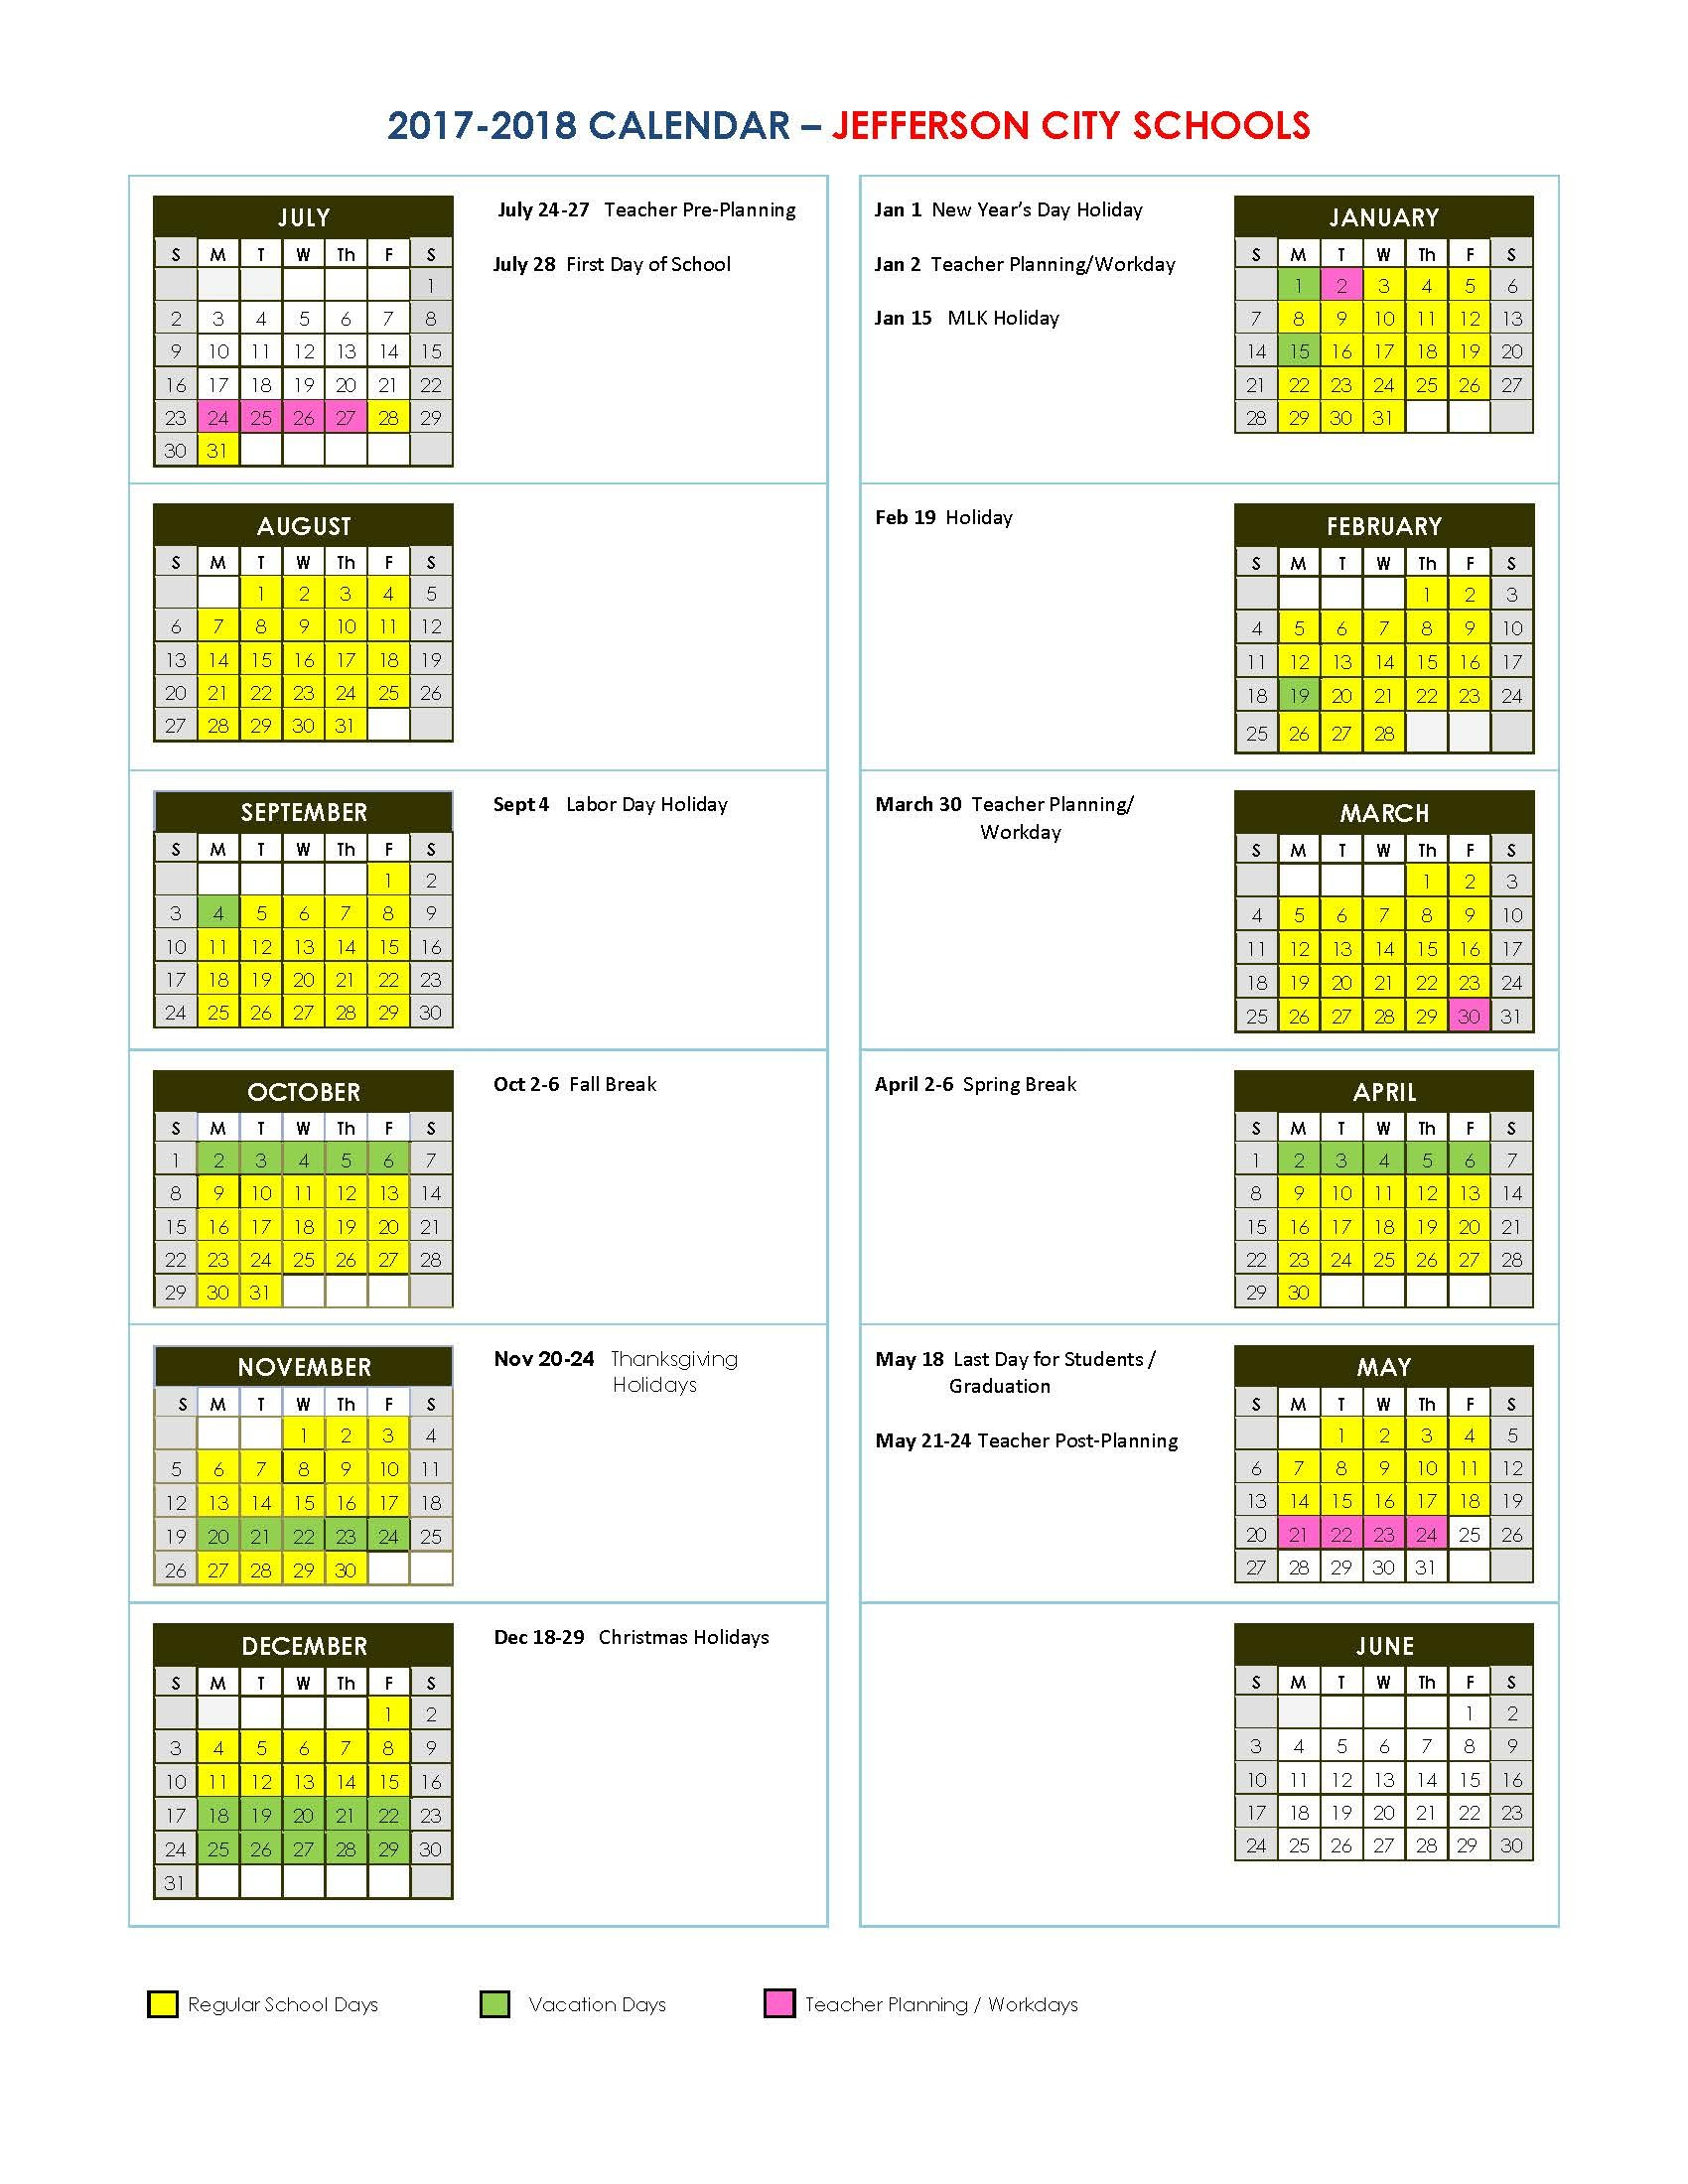 Uga Spring 2018 Academic Calendar Printable For 100 % Free in 2019- 2020 Calendar Printable Uga